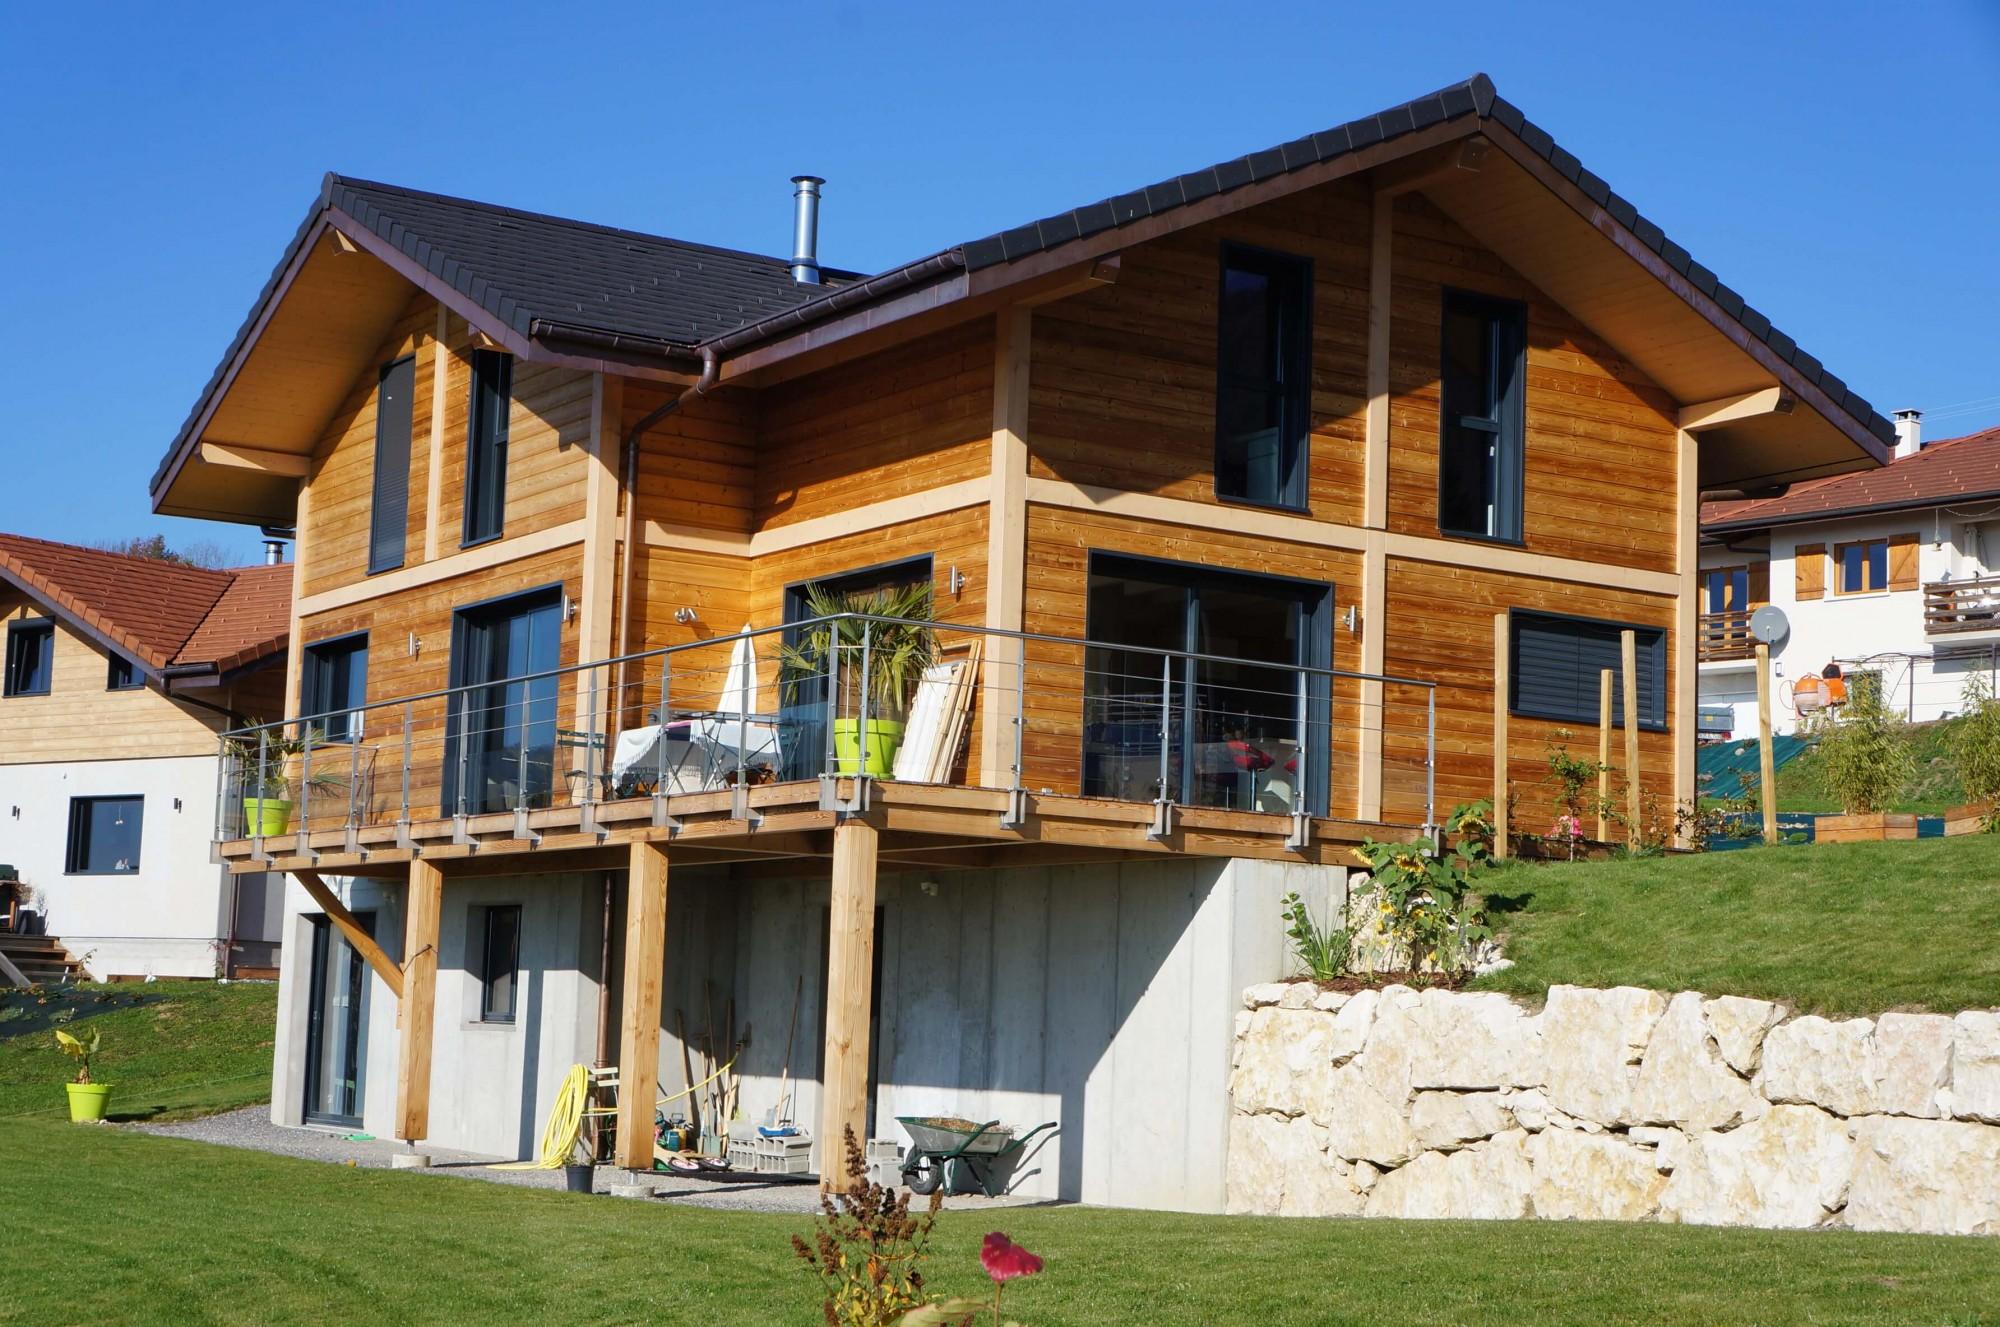 Jolly construction bois imaginer construire r nover for Construction en bois neuchatel